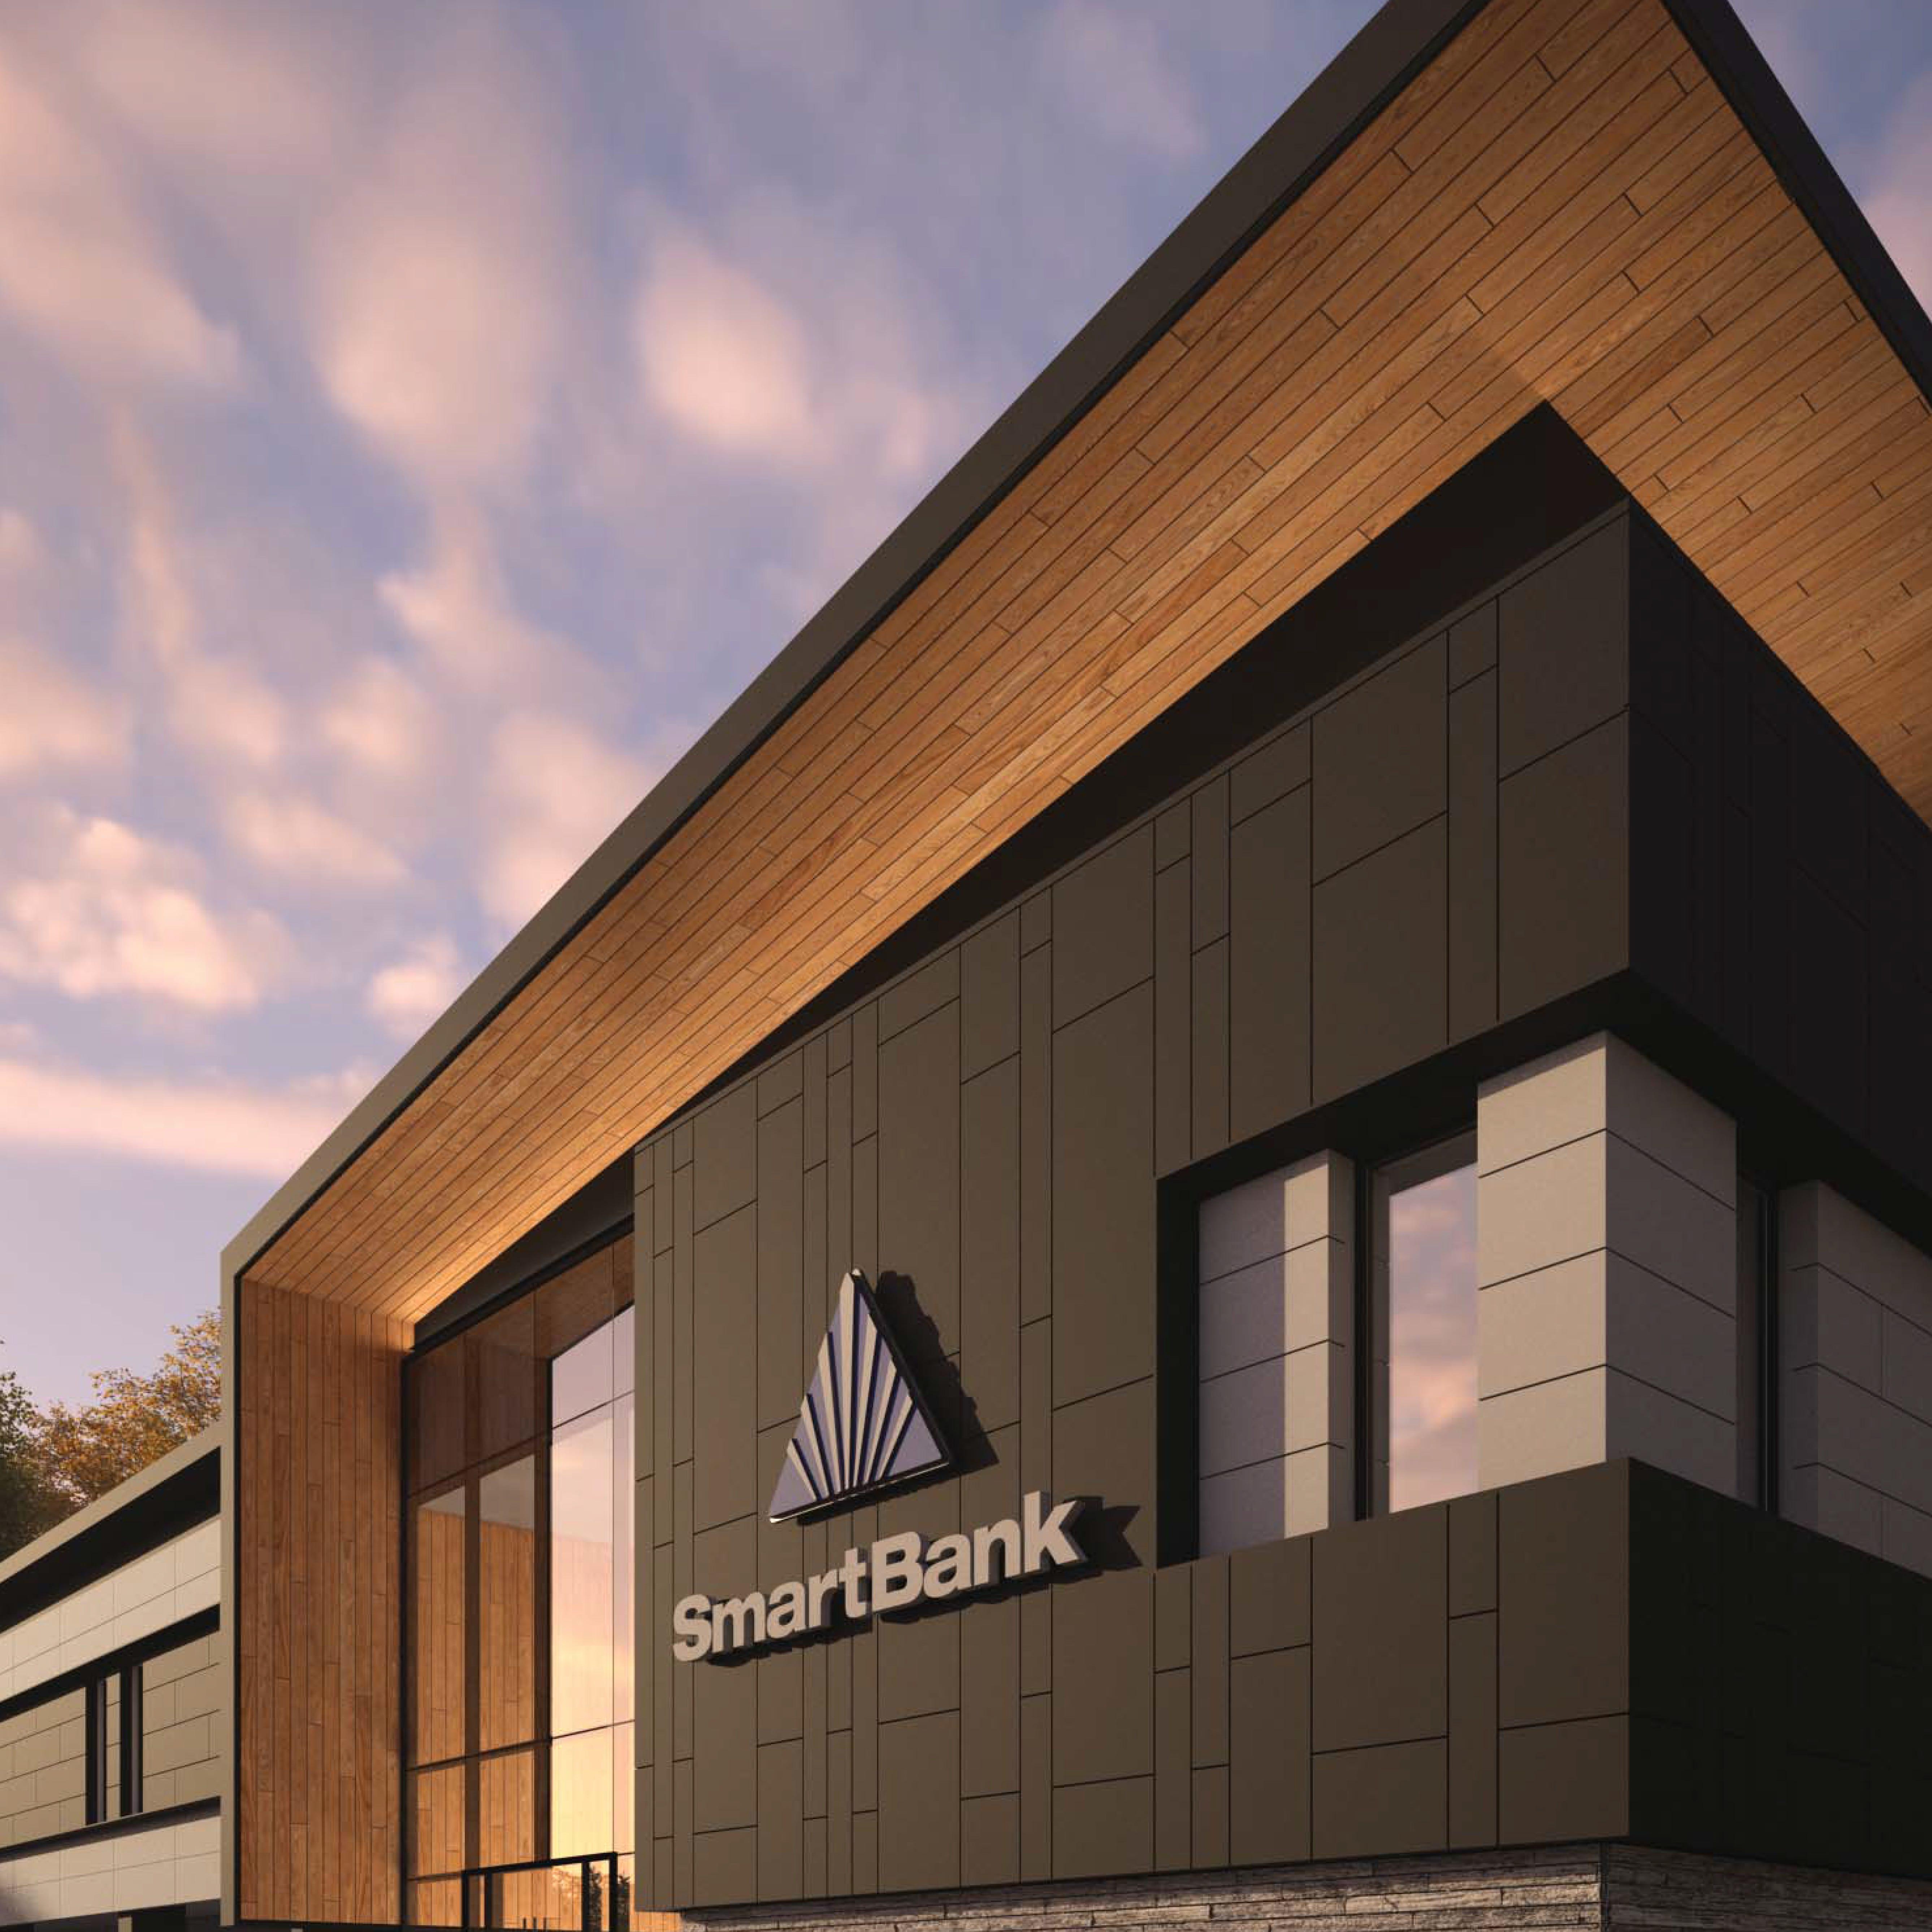 SmartBank nearing $158M merger with North Carolina-based bank